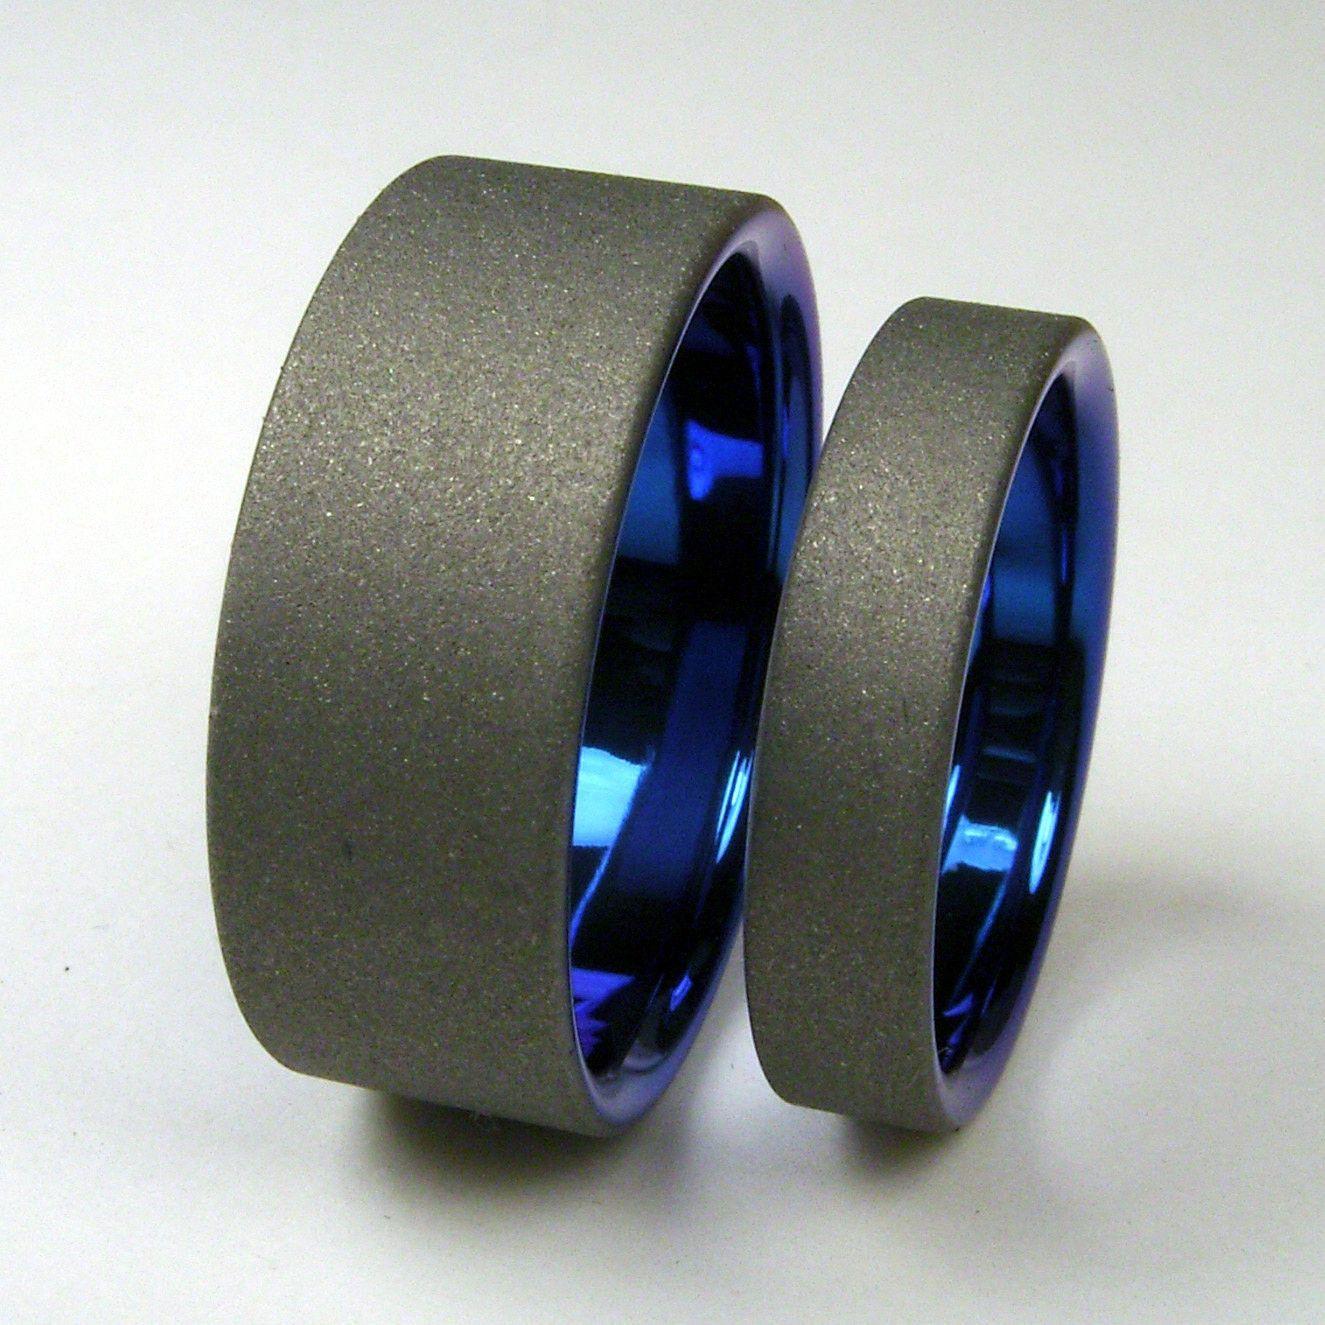 Titanium wedding band set cobalt blue and matte gray